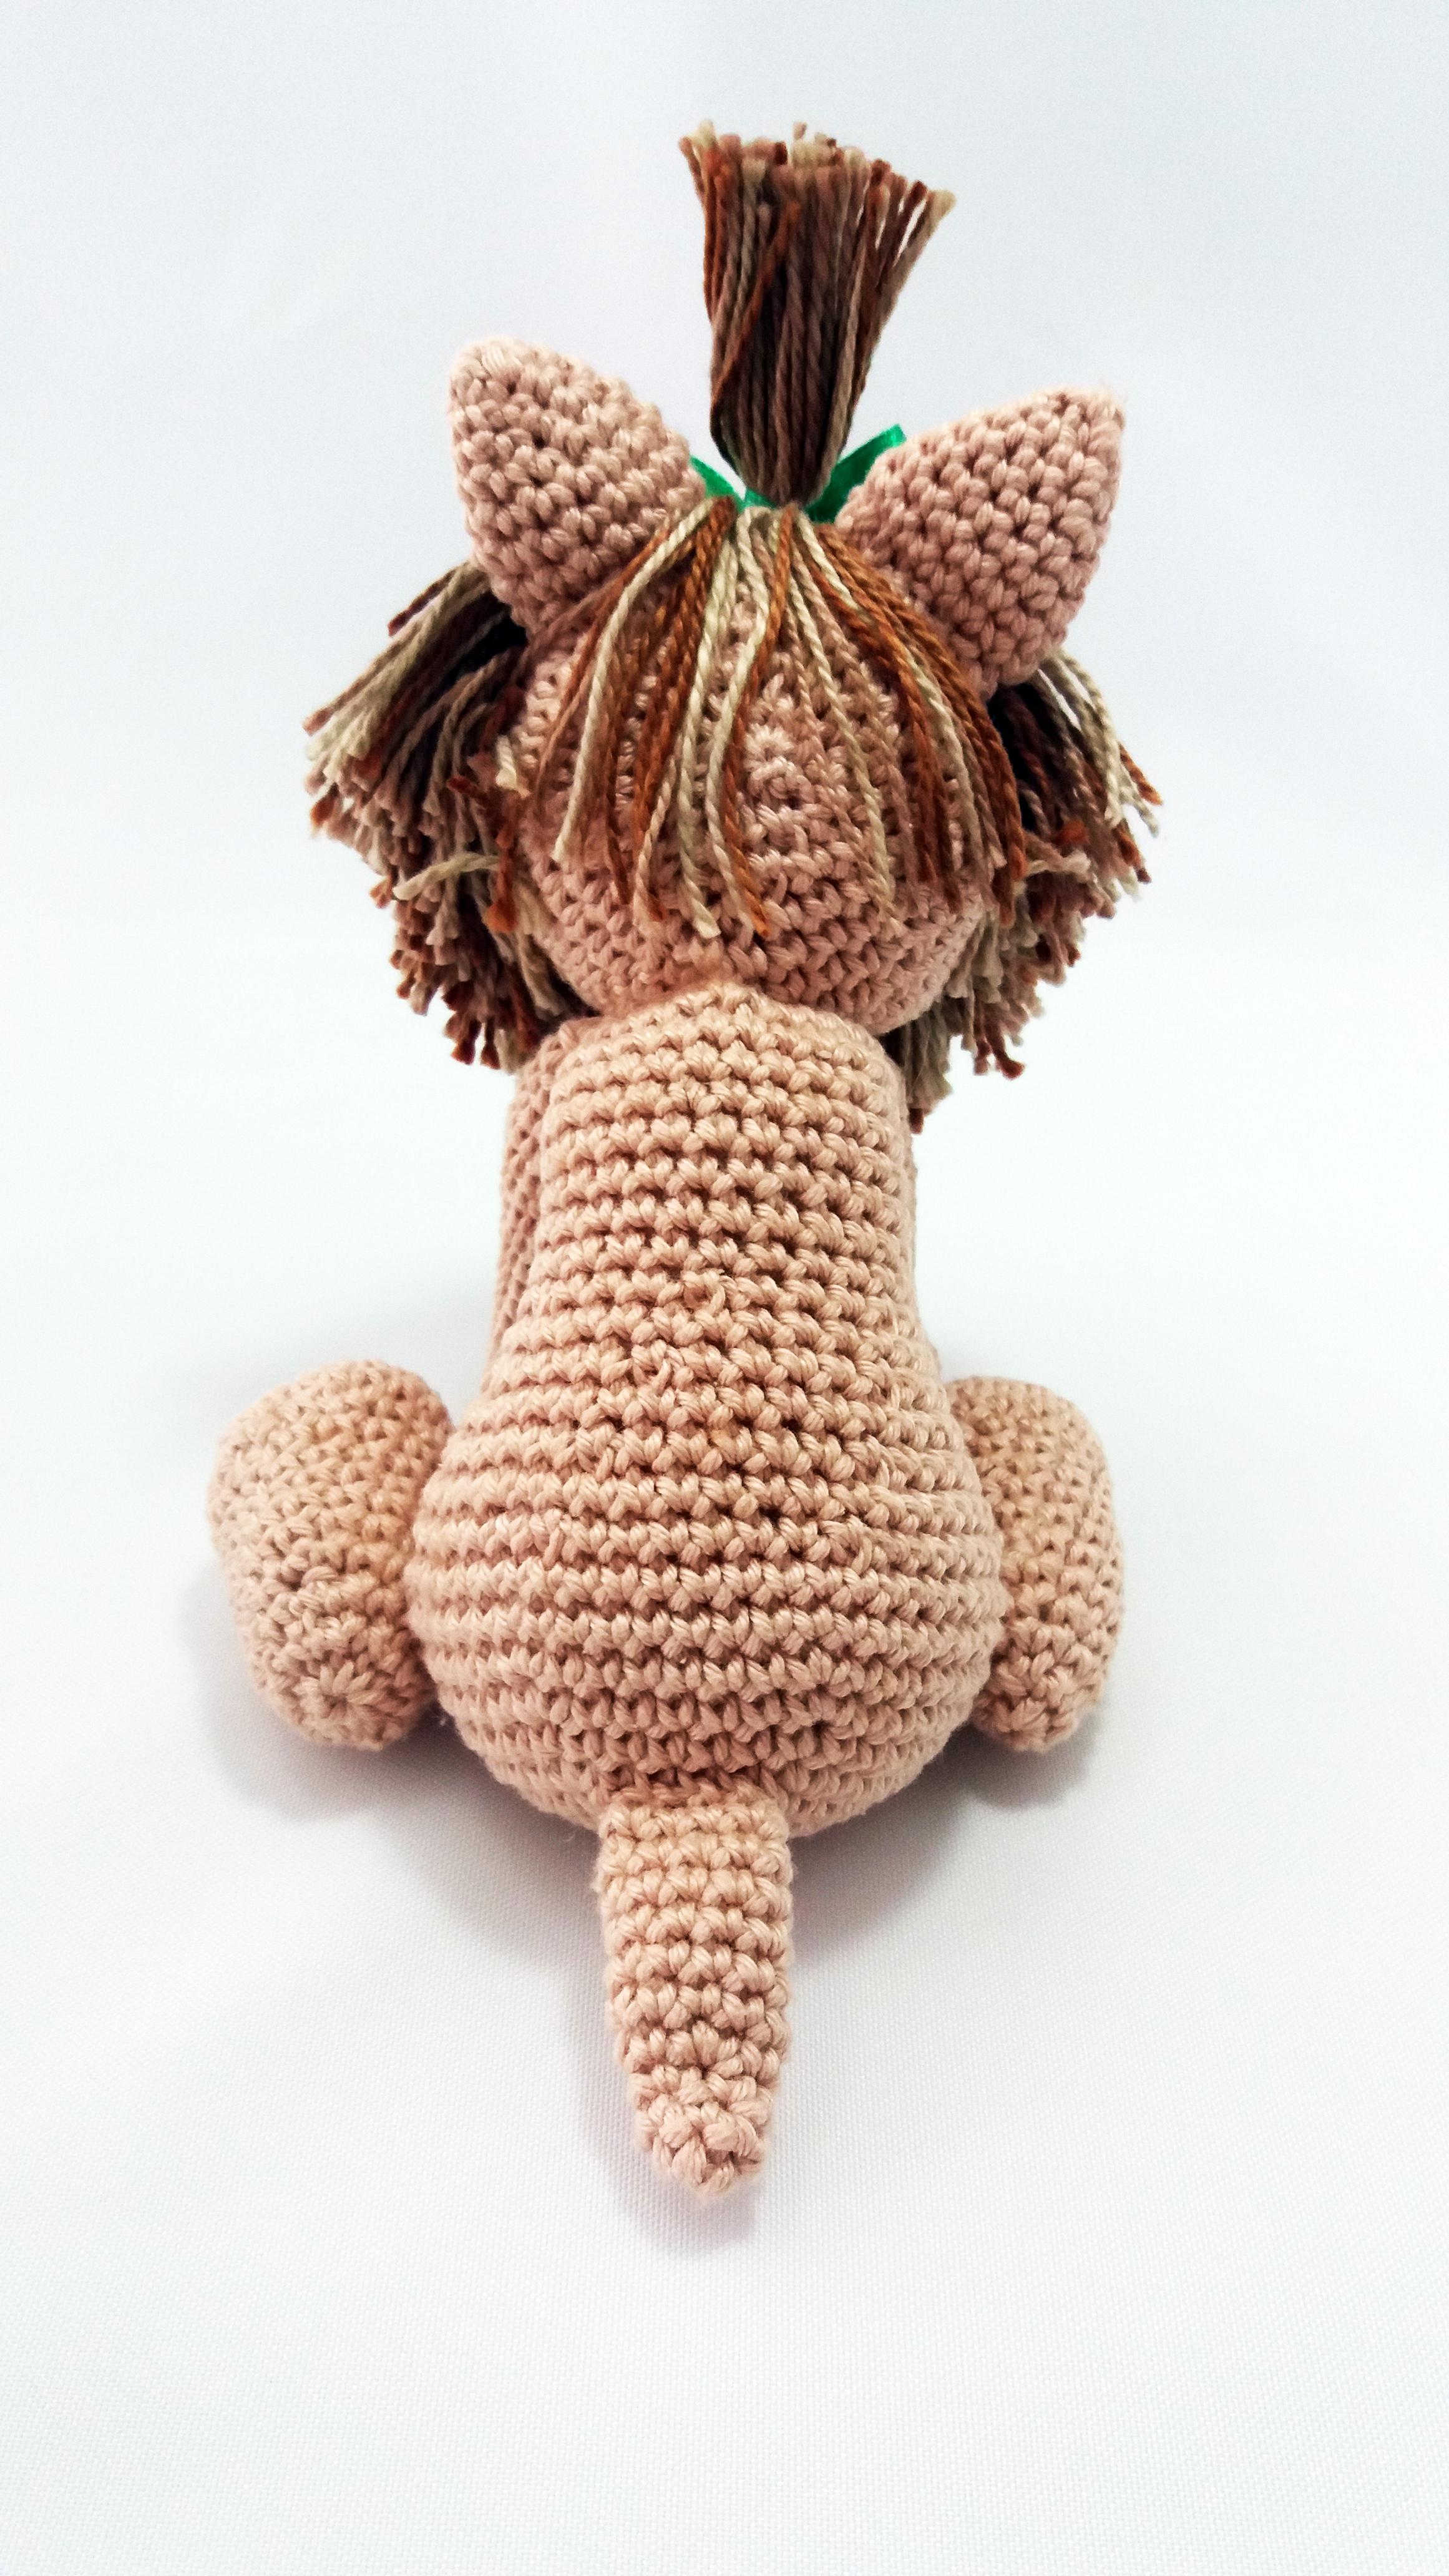 Amigurumi Yorkshire Terrier 'YORKIE'- Free Crochet Pattern ... | 4128x2322